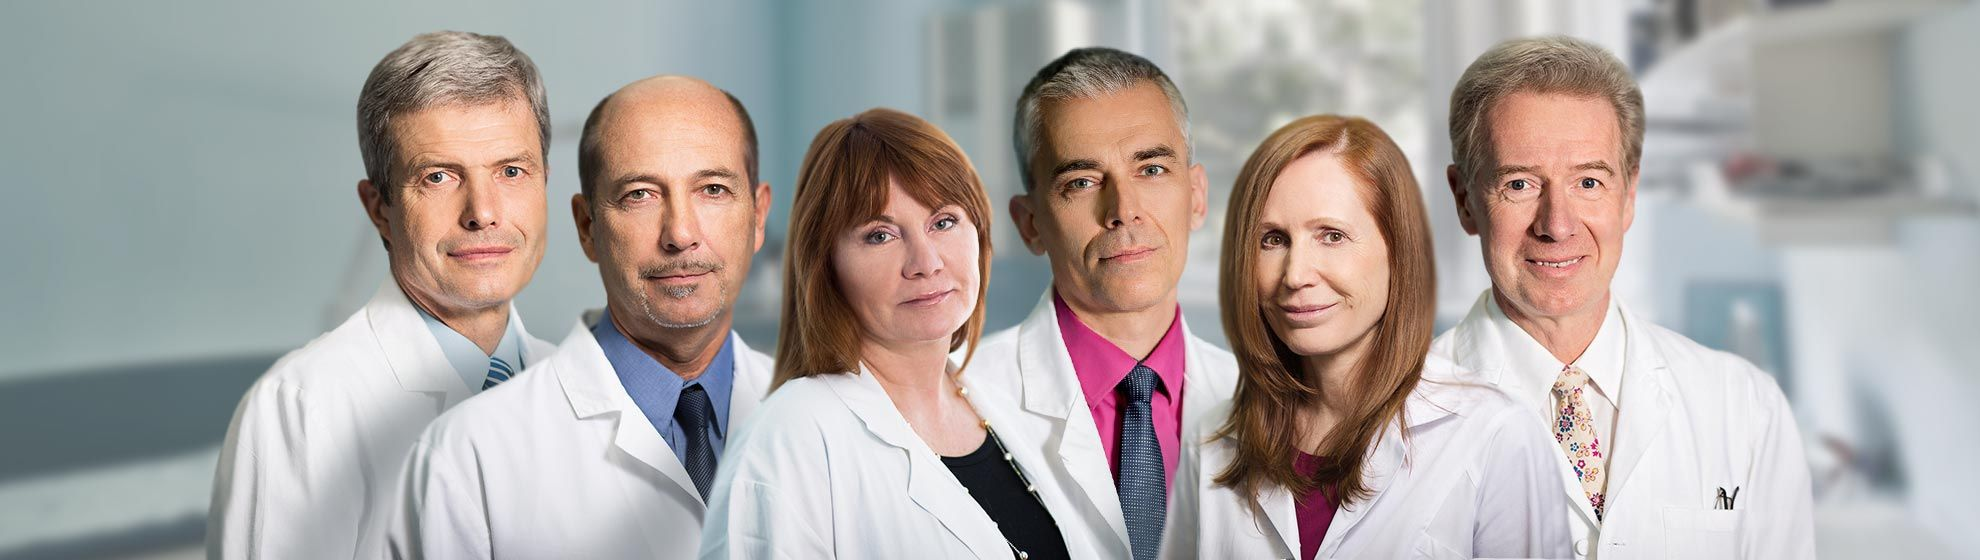 Body klinika plastické chirurgie